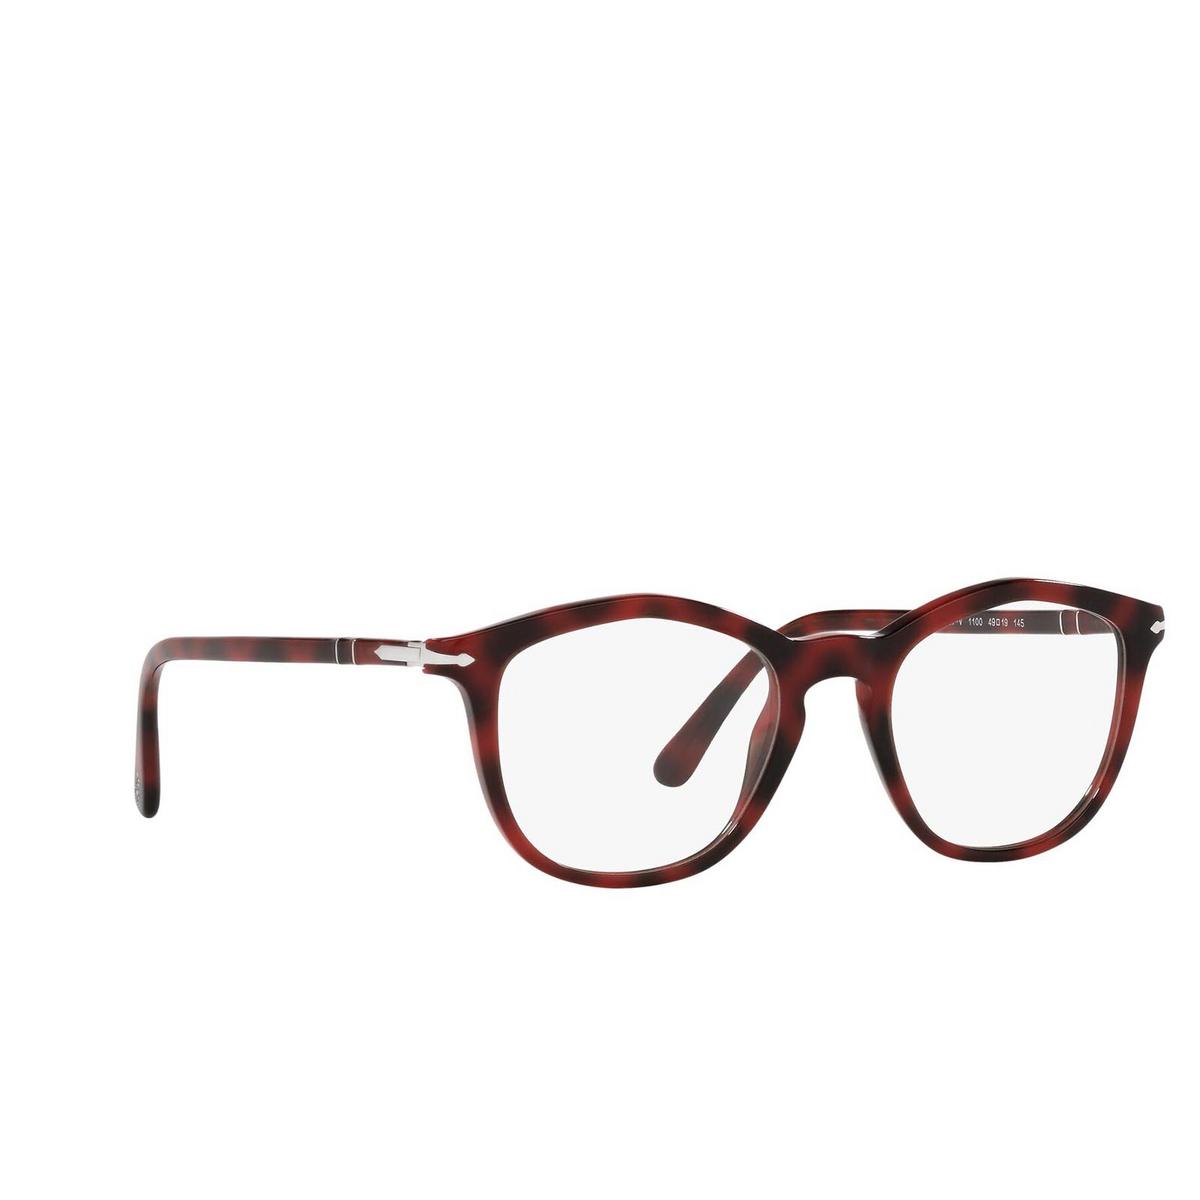 Persol® Irregular Eyeglasses: PO3267V color Red 1100 - three-quarters view.